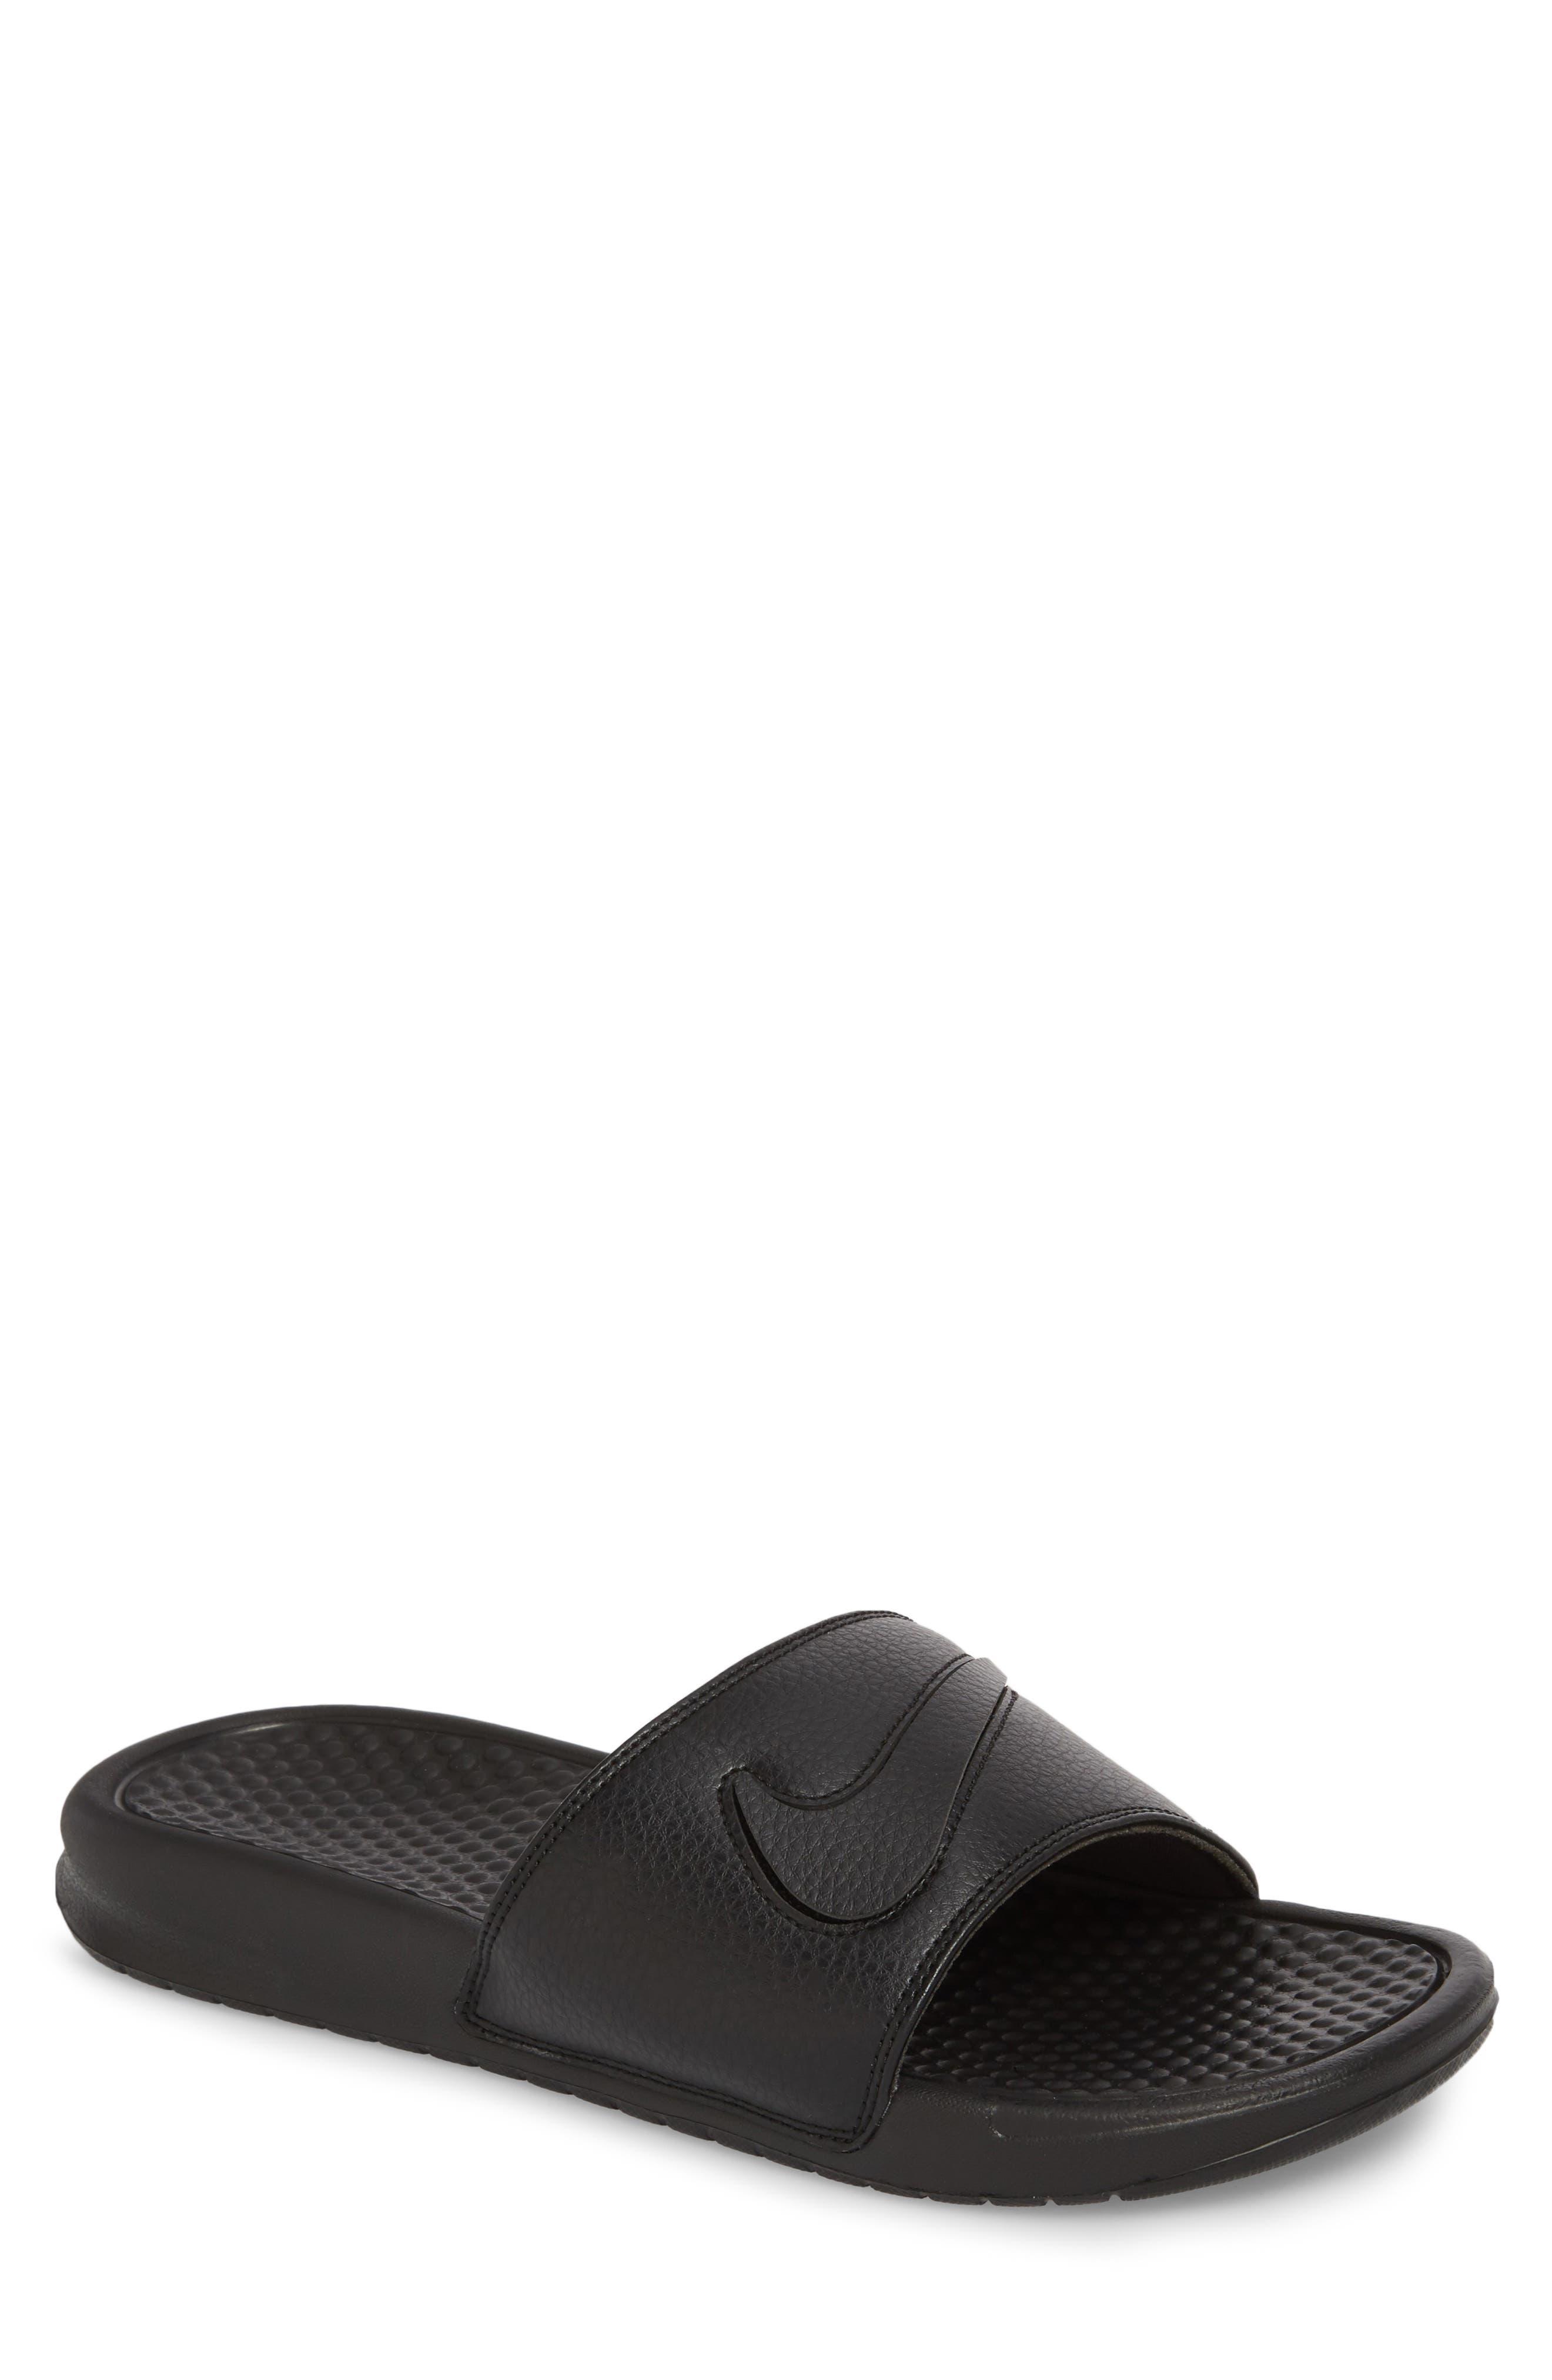 NIKE Benassi JDI Customizable Slide Sandal, Main, color, 001